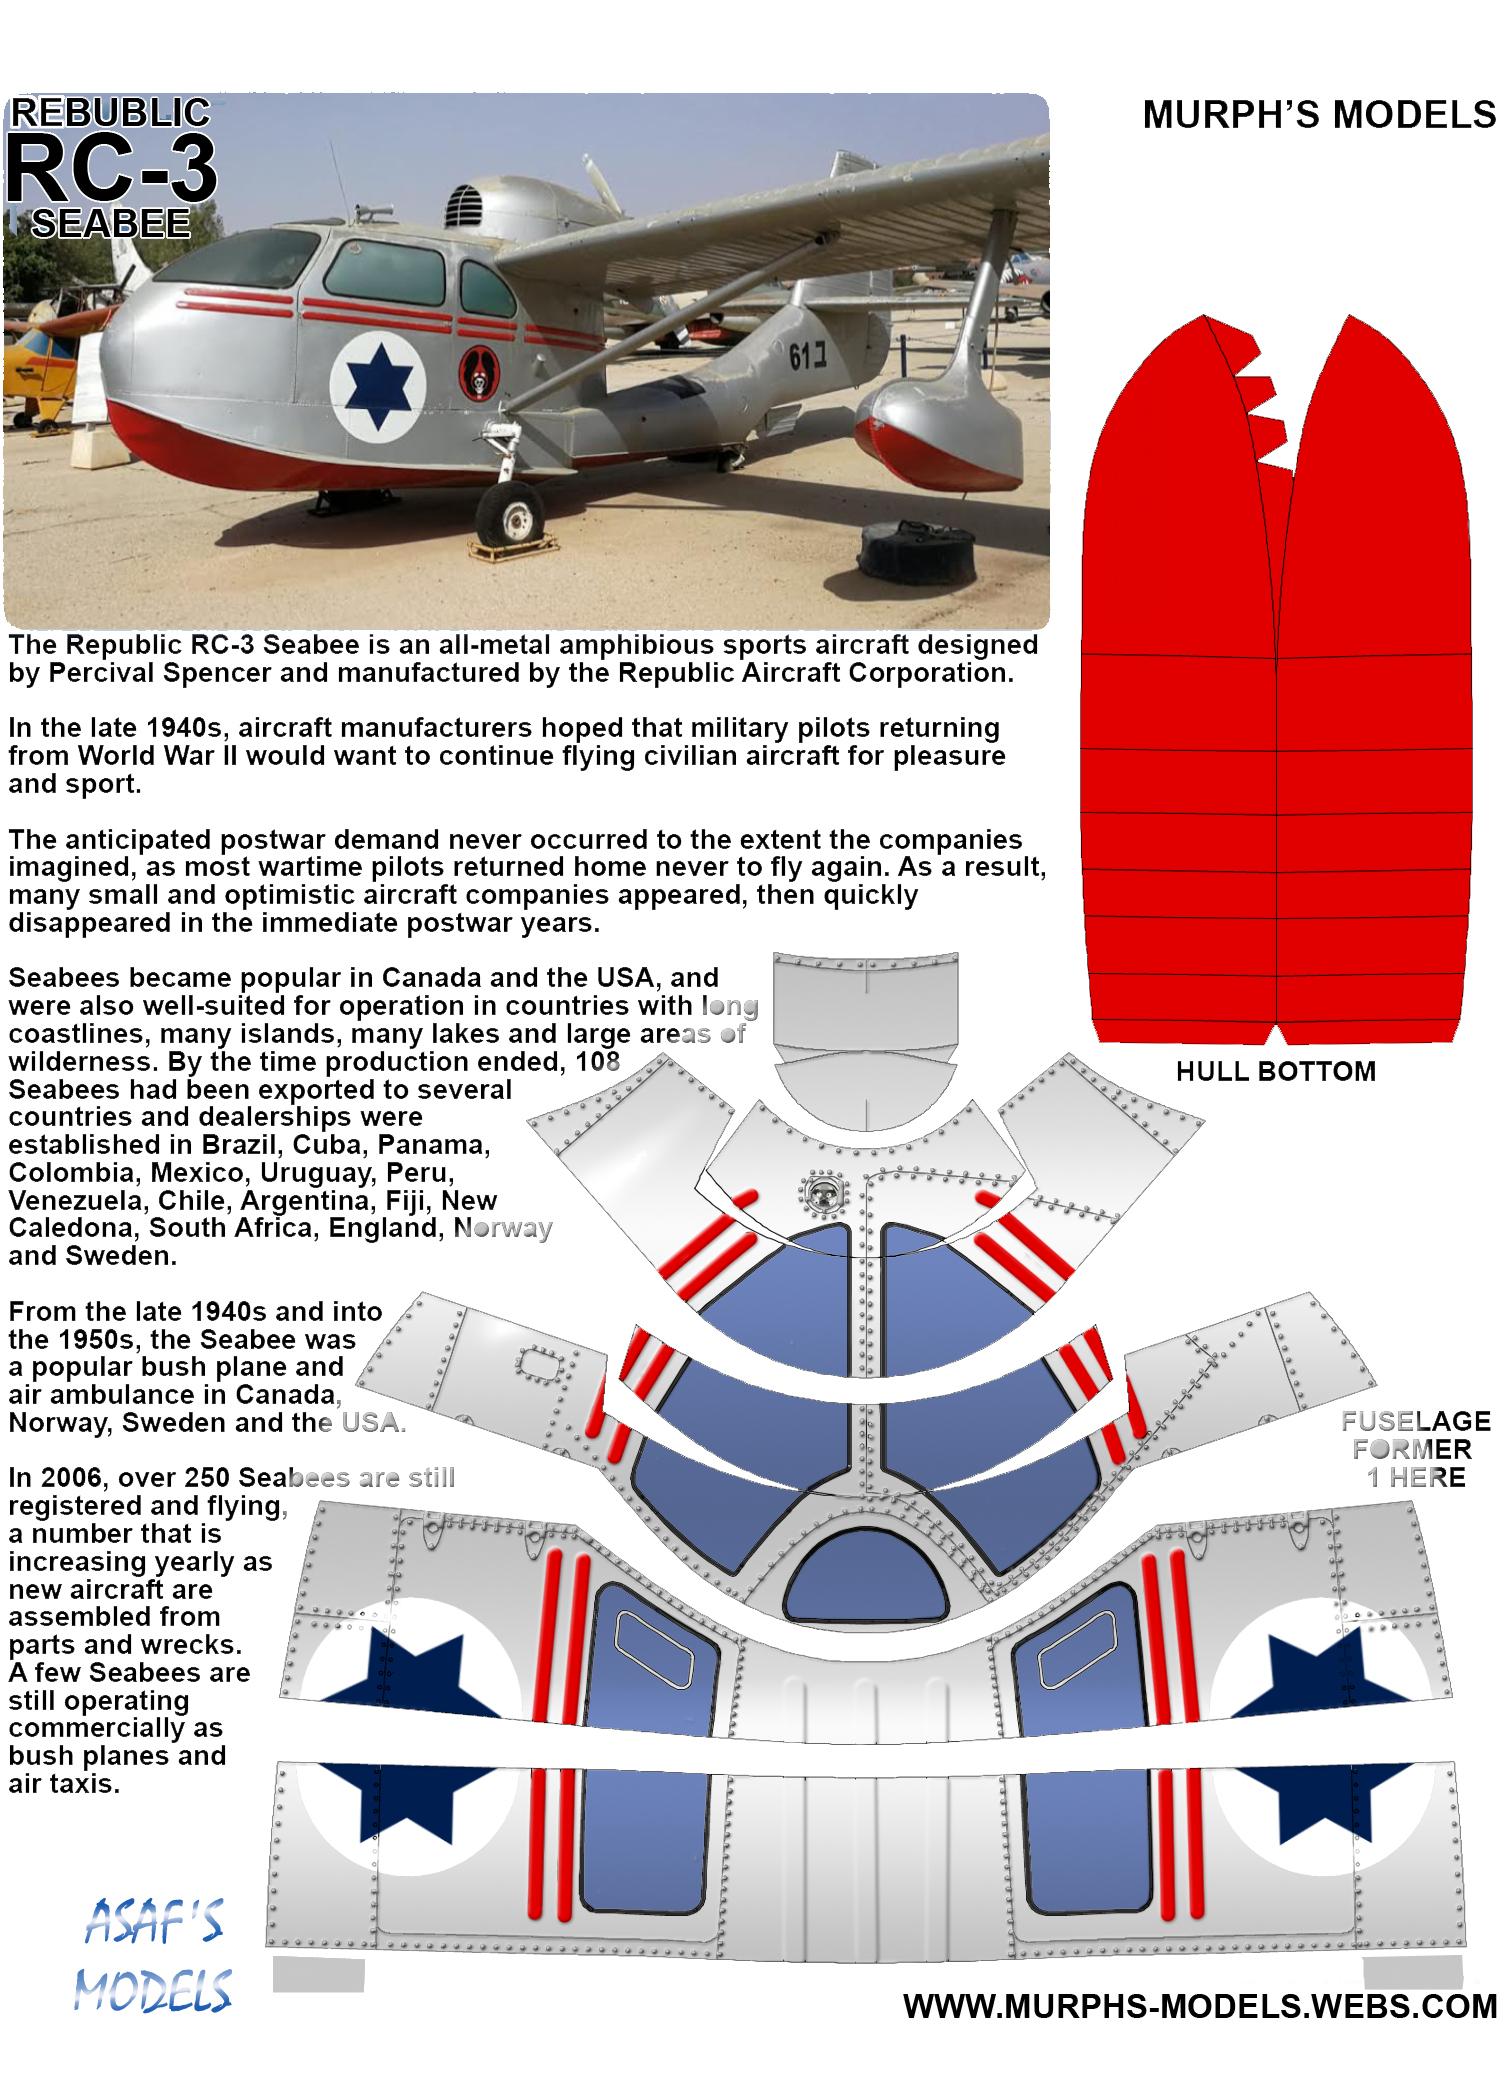 Murph's Models - Republic RC-3 SeaBee